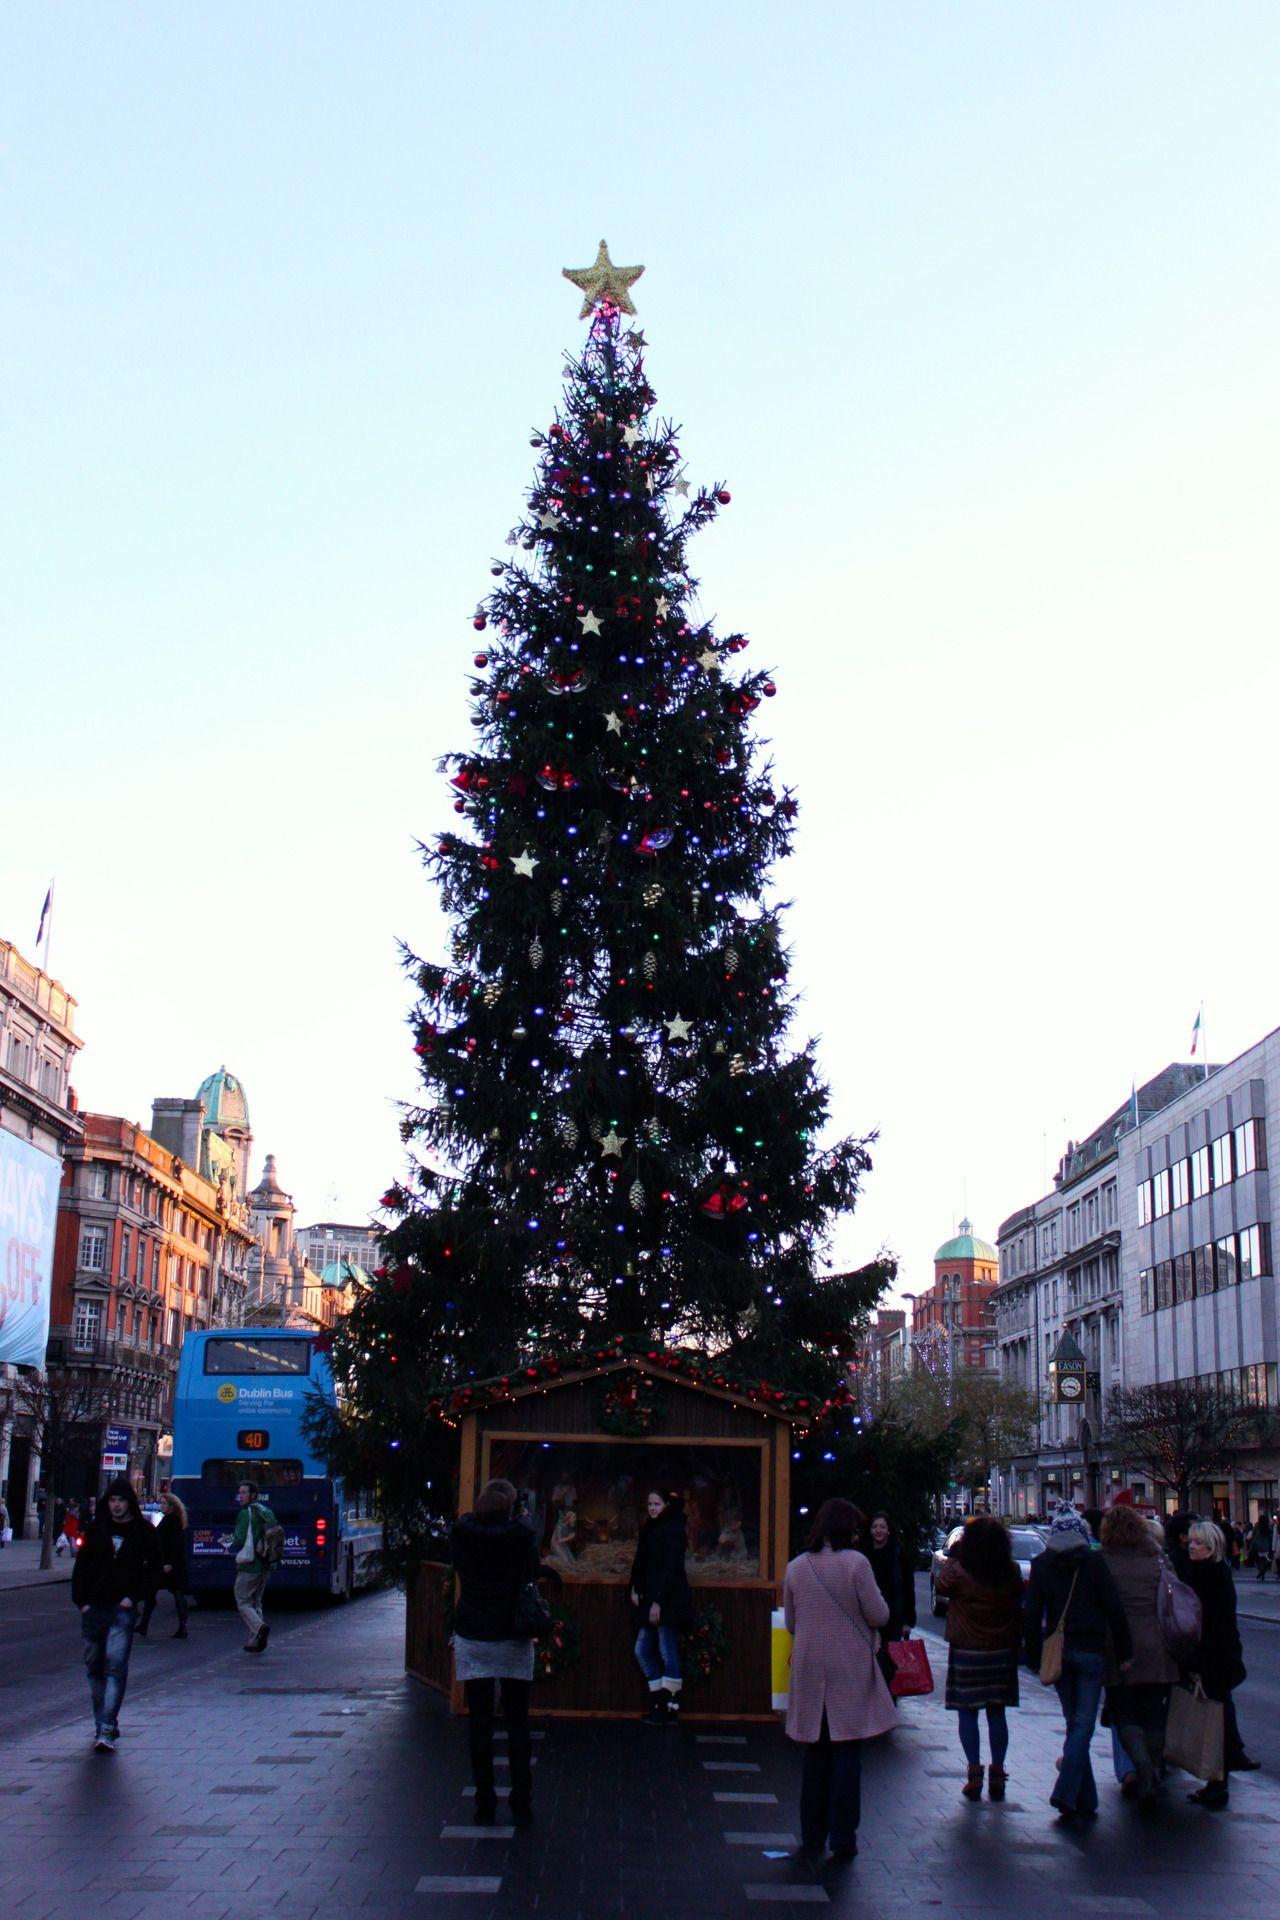 O'Connell Street, Christmas Tree, Dublin, Ireland